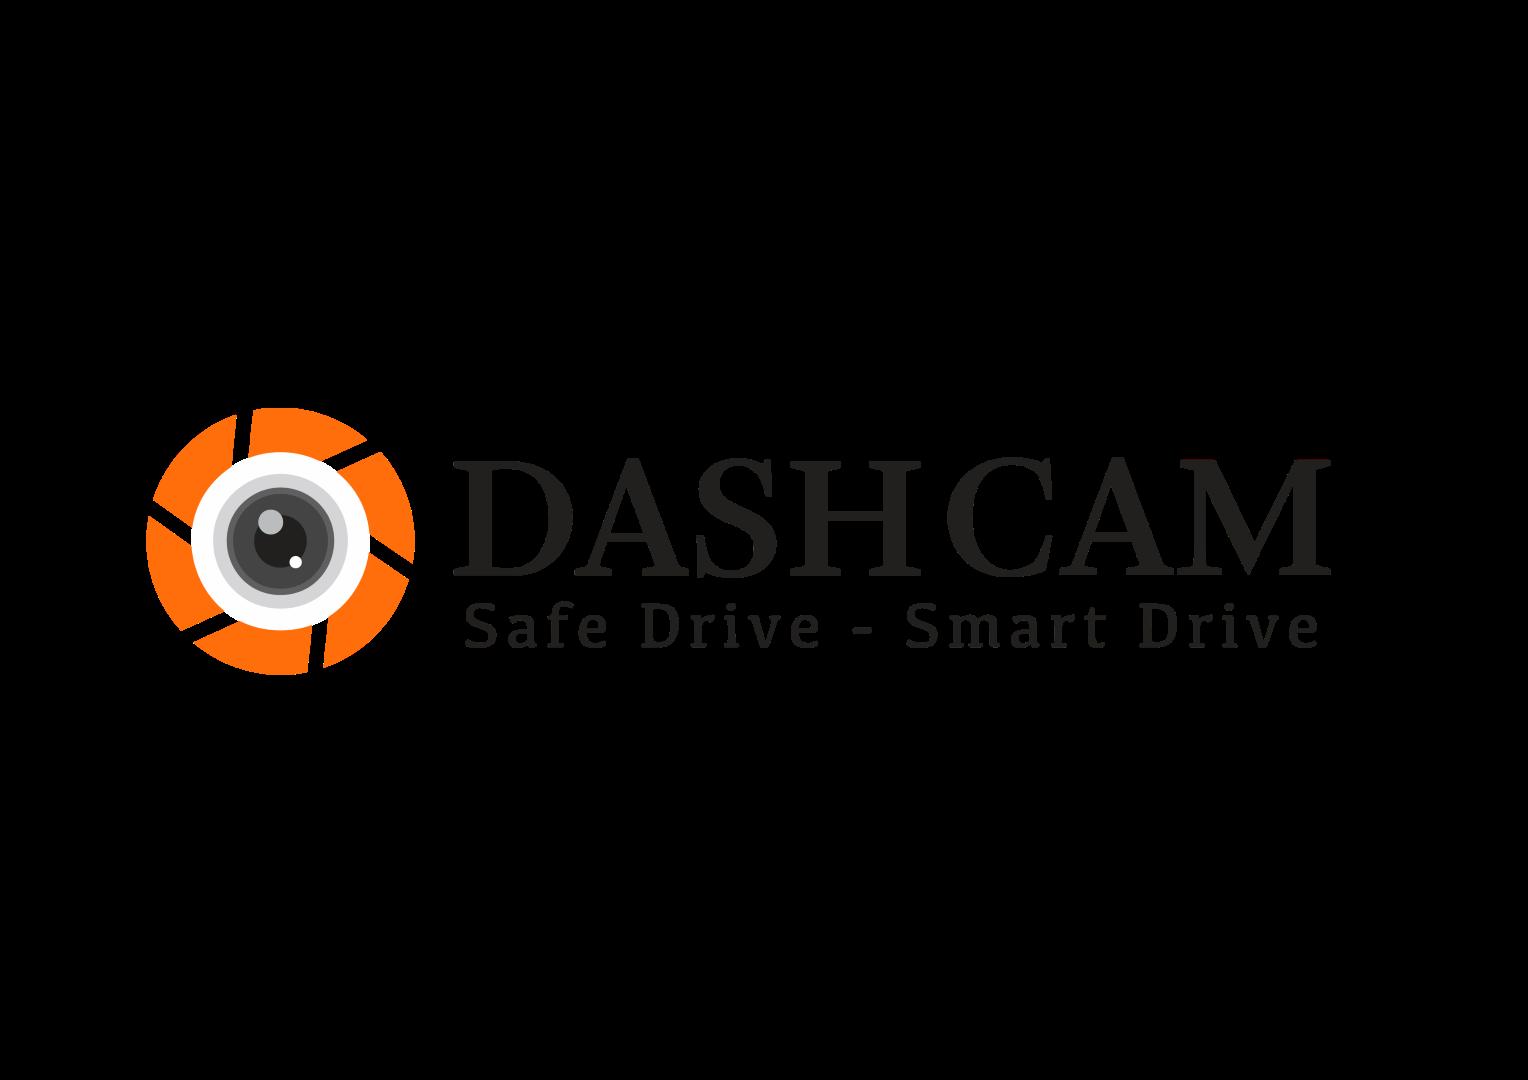 comment-choisir-sa-dashcam-1101-8.png